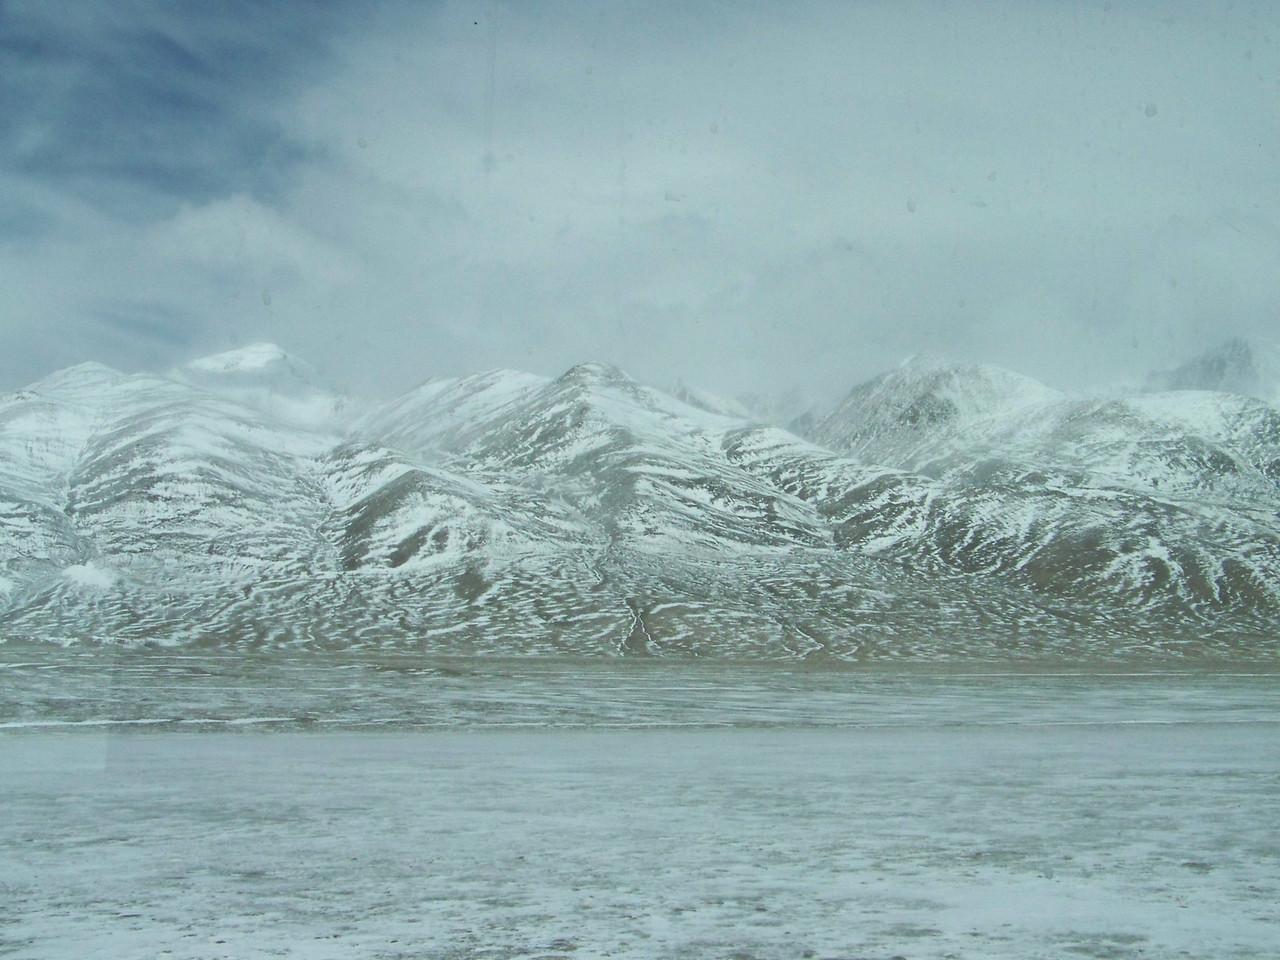 0113 - Scenery on Train Trip Between Beijing and Lhasa.JPG